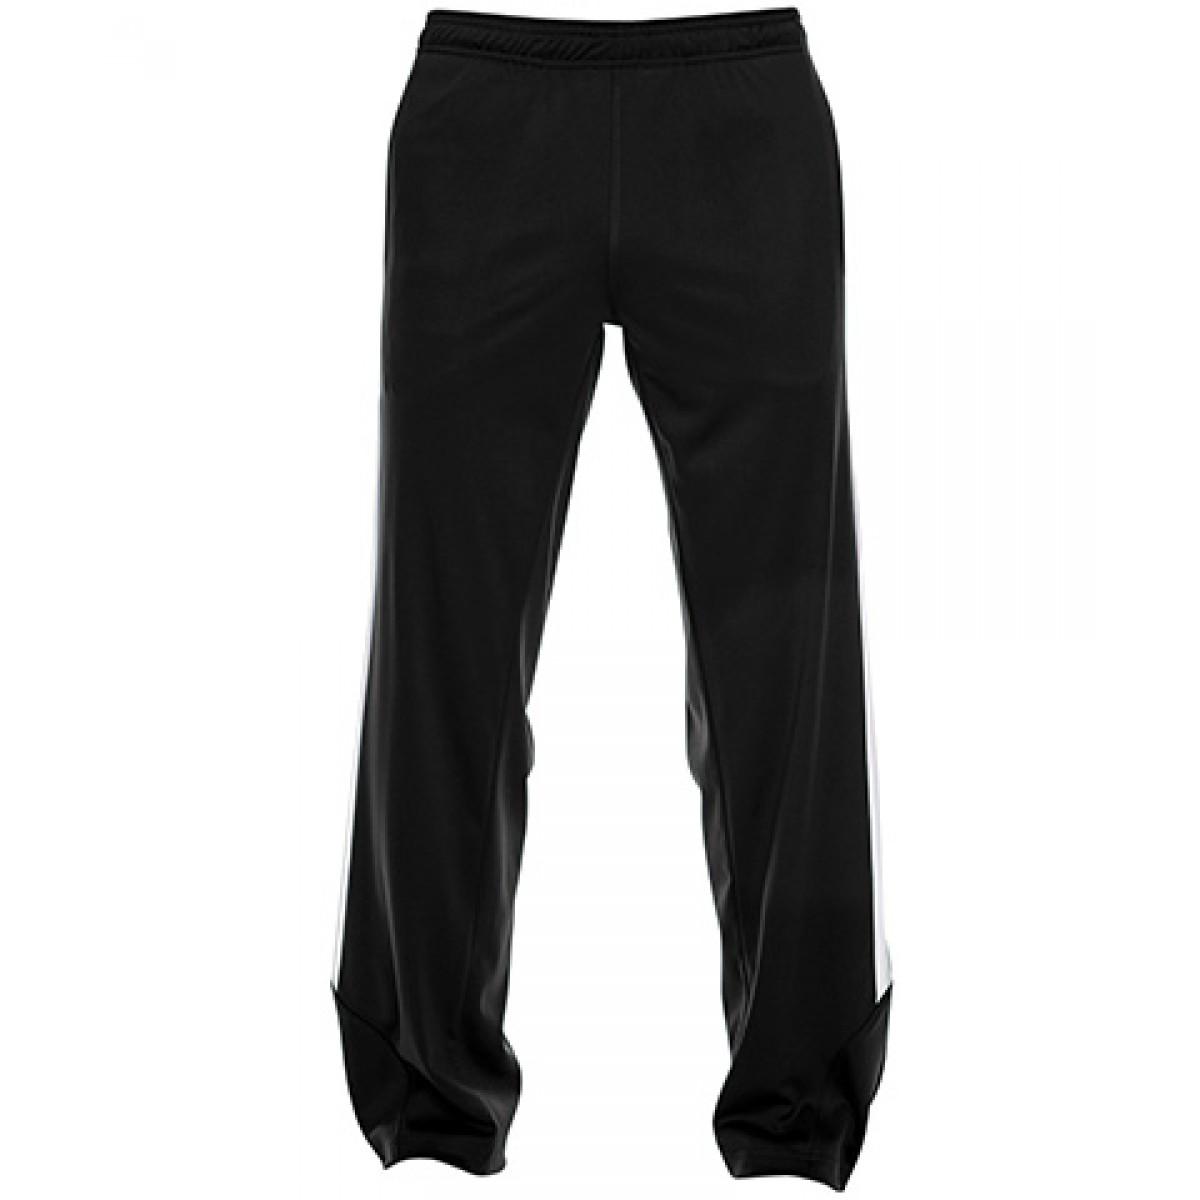 Men's Elite Performance Fleece Pant-Black-3XL